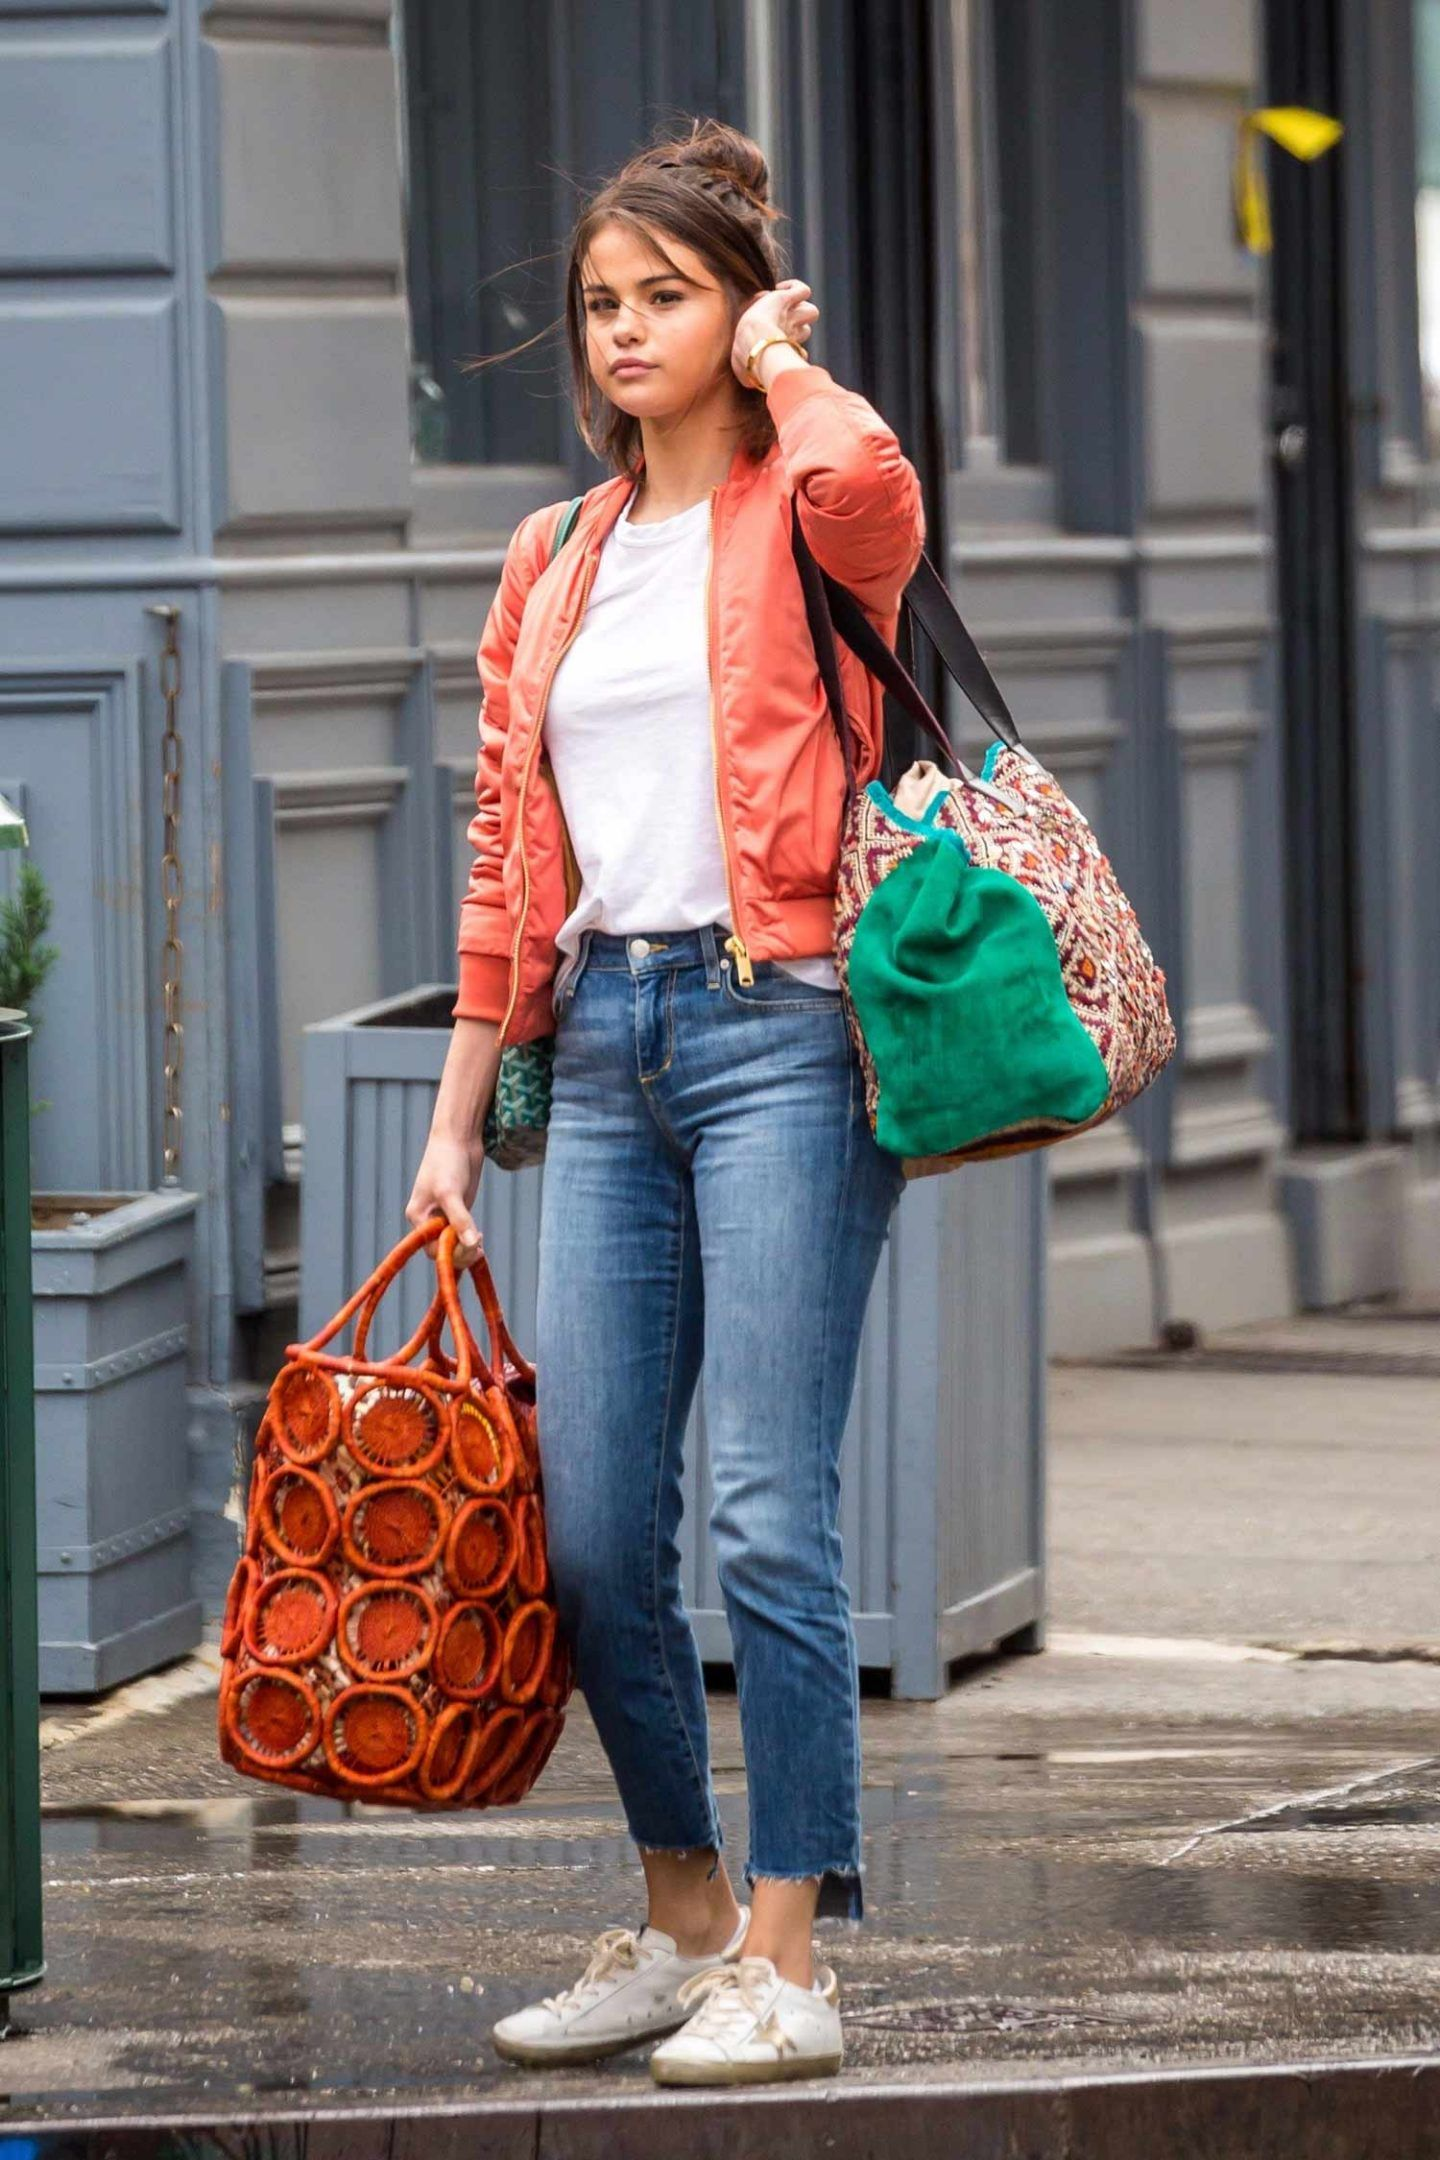 The Jeans Blog | Denim Reviews, Trends & Celebs in Denim | Jeans ...